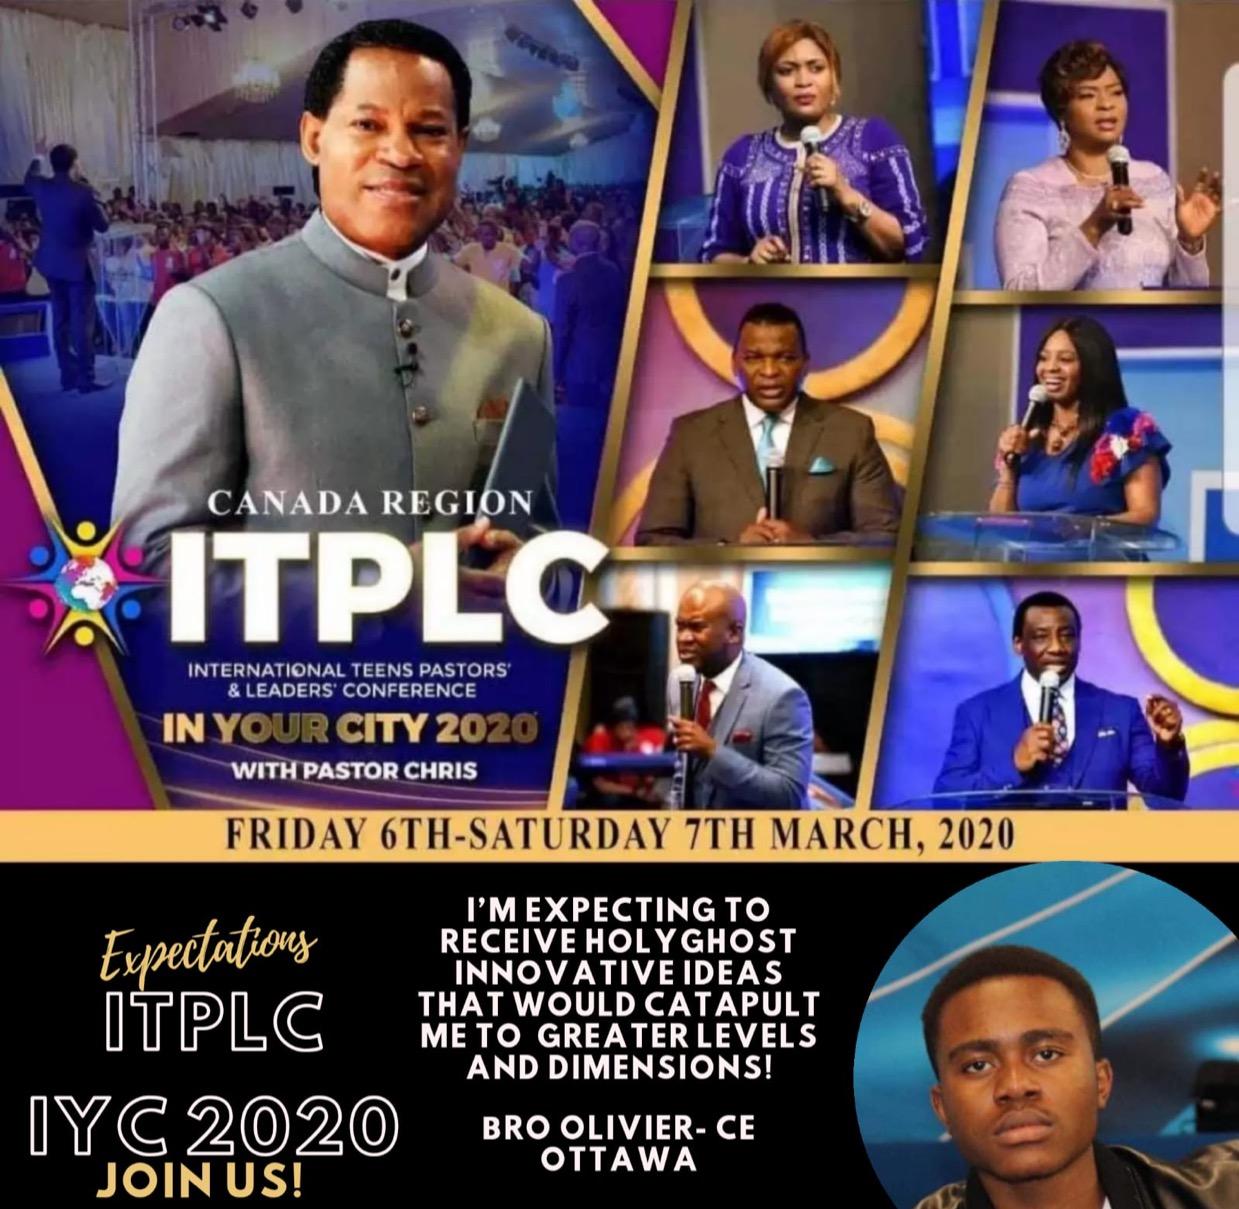 2 DAYS TO #ITPLC CANADA